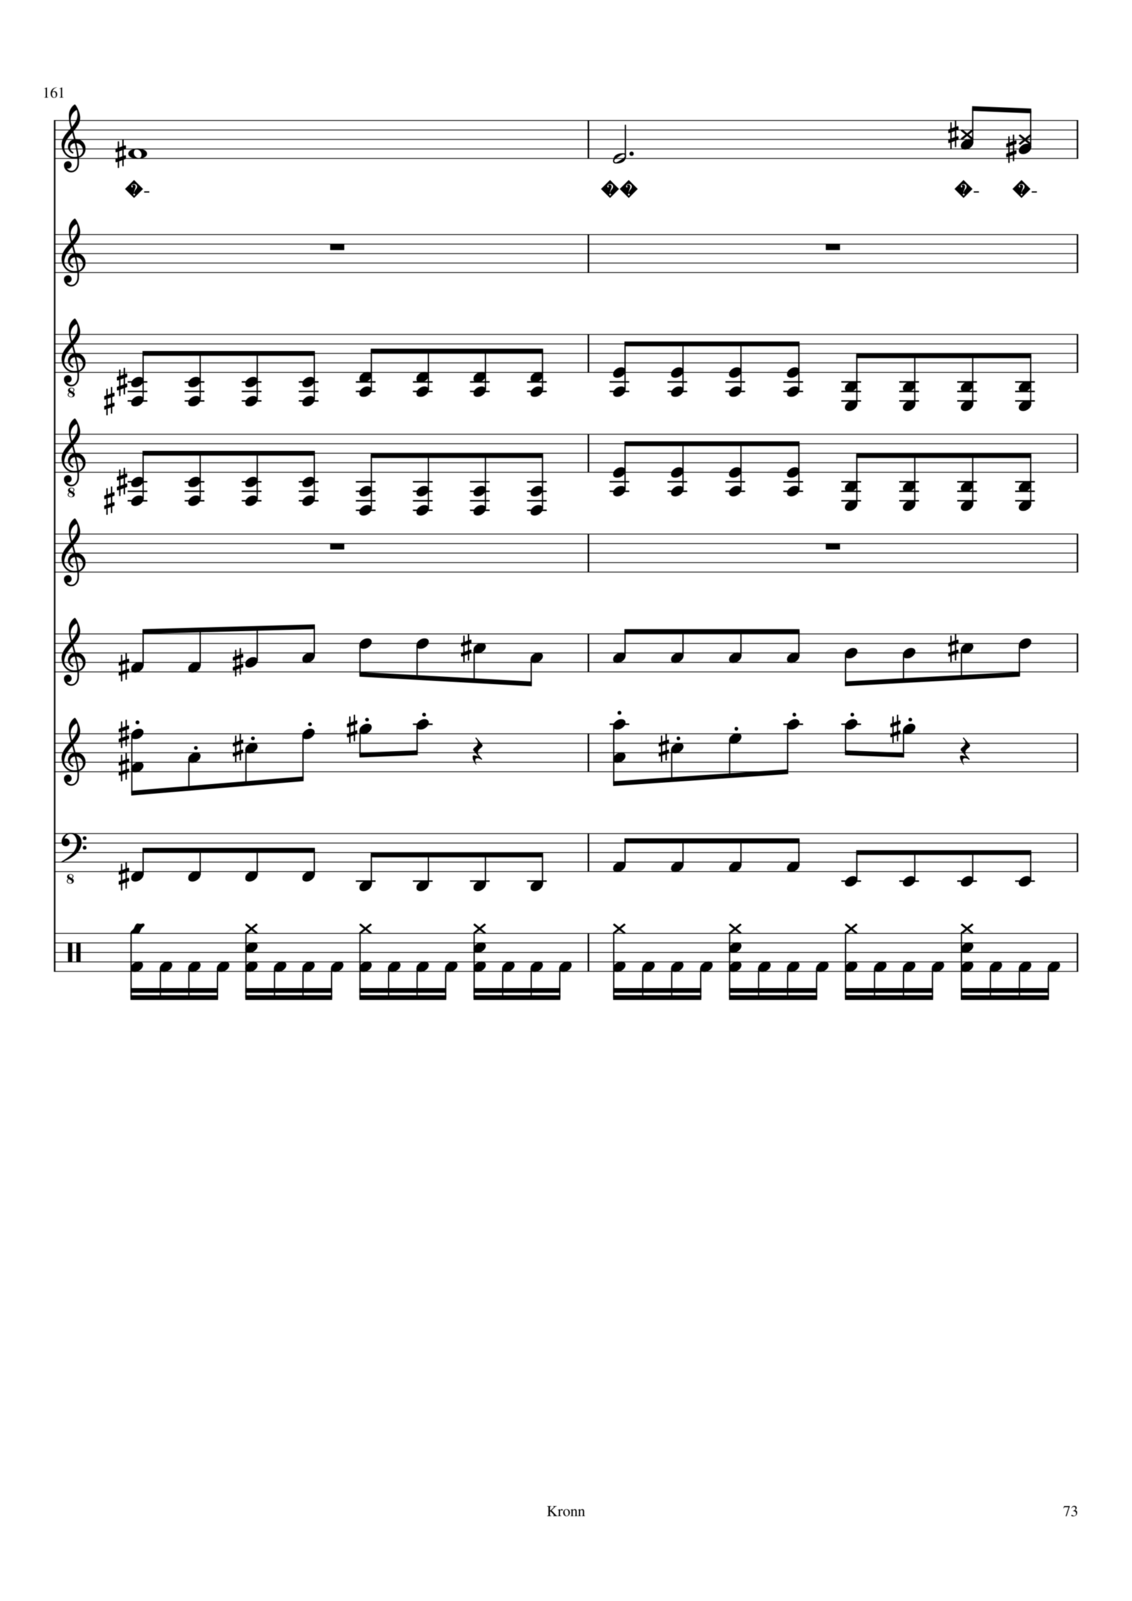 Ispoved Pervogo Boga slide, Image 73